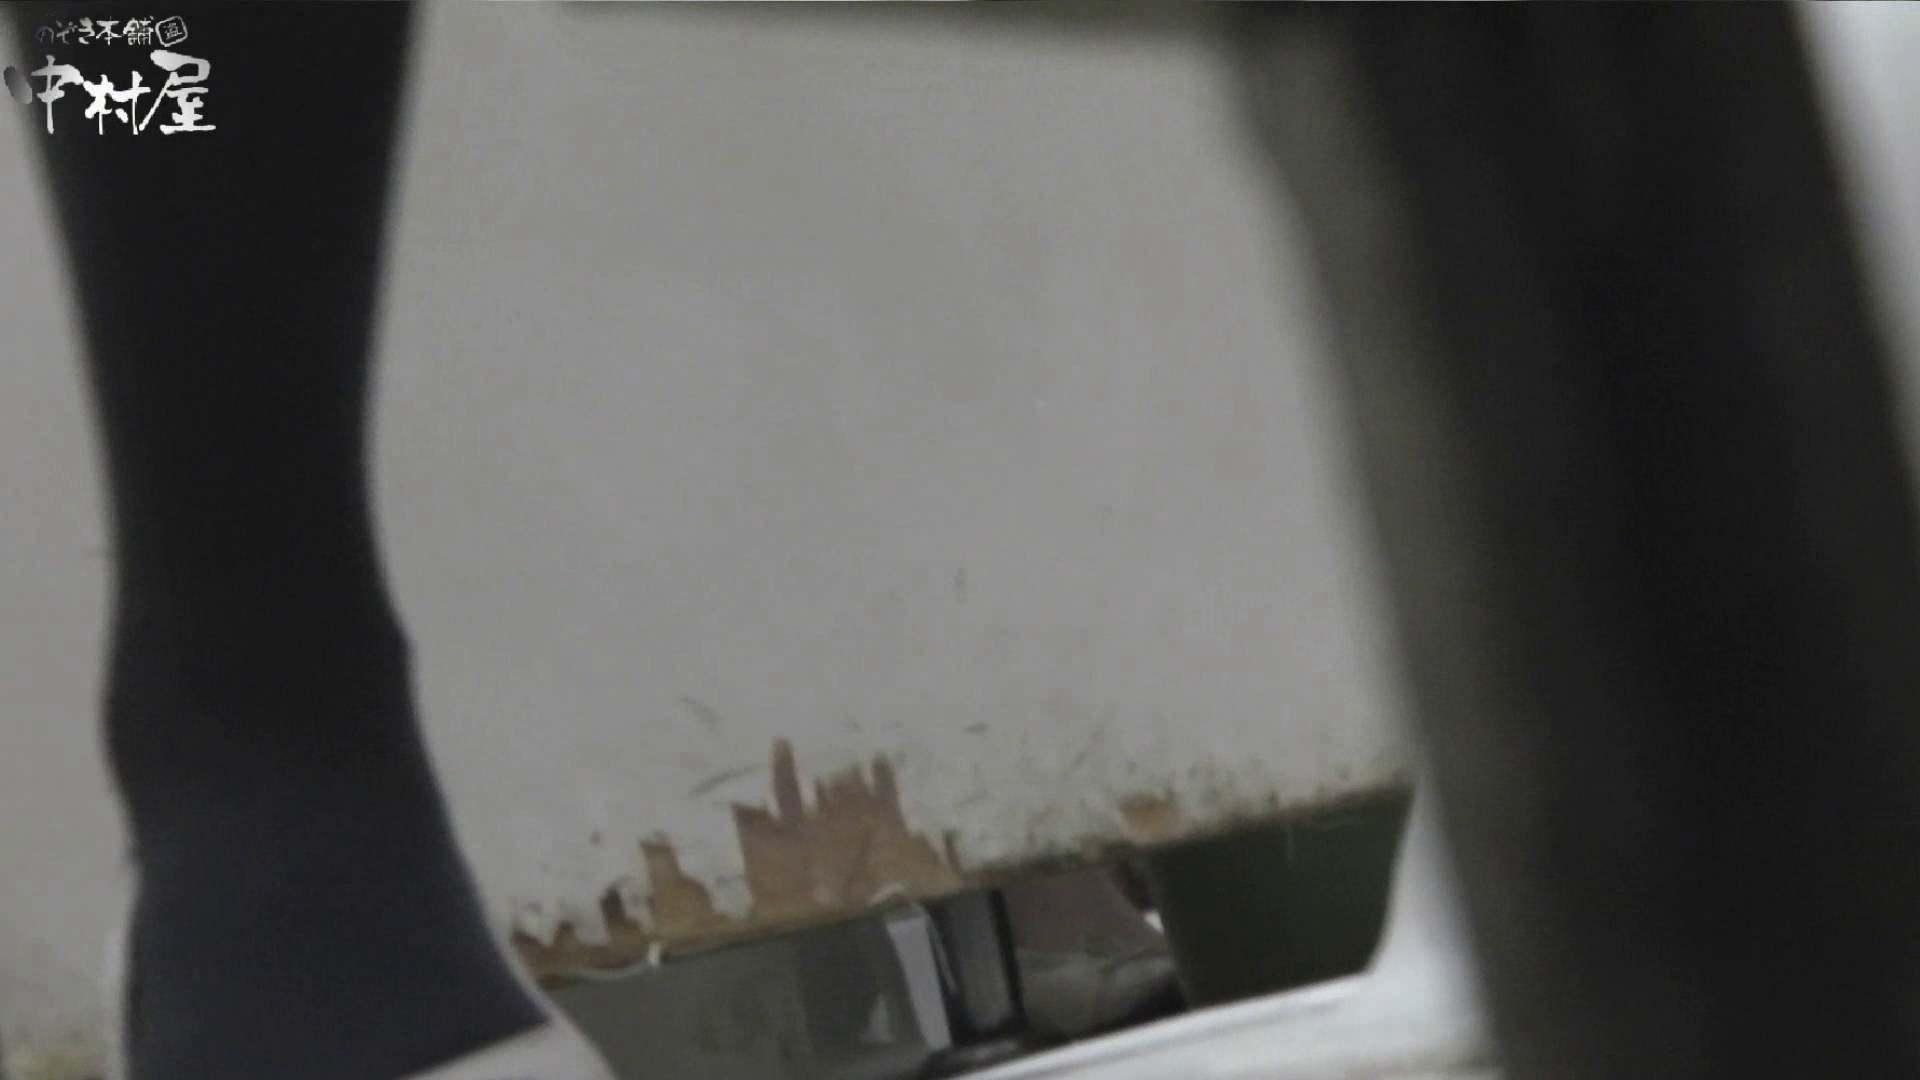 vol.41 命がけ潜伏洗面所! 毛薄め・硬度並・推定250g OLエロ画像 盗撮アダルト動画キャプチャ 89PICs 62